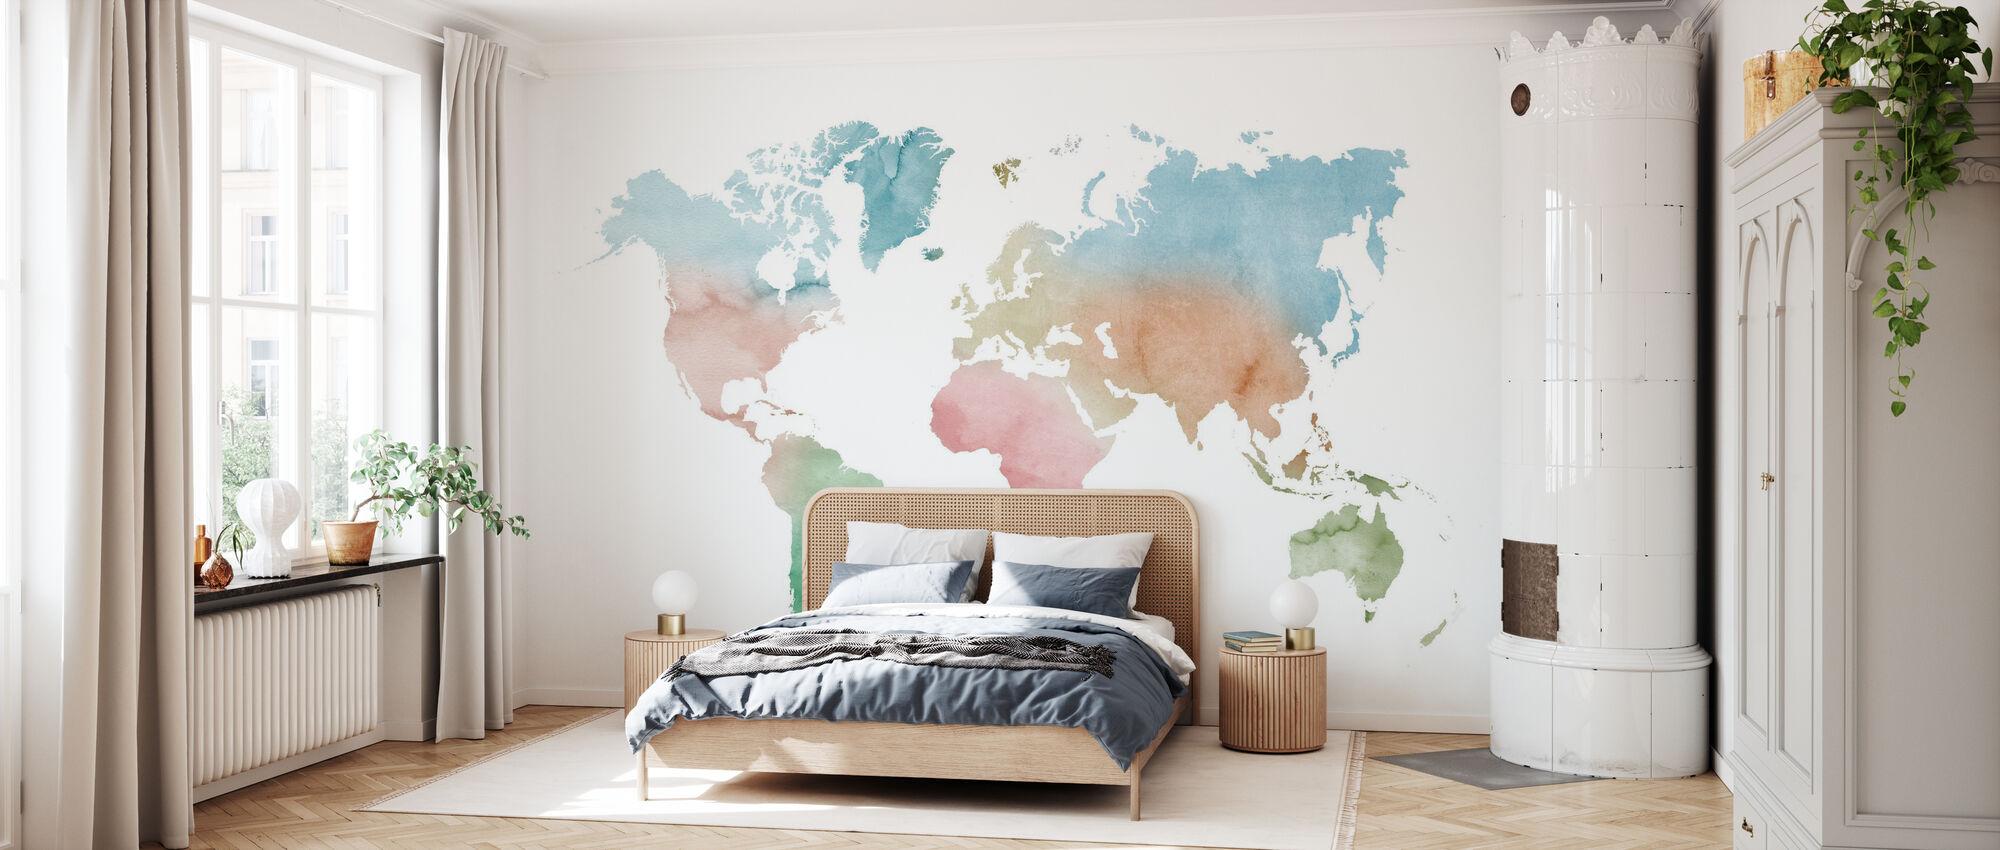 Watercolor World Pastel Colors - Wallpaper - Bedroom